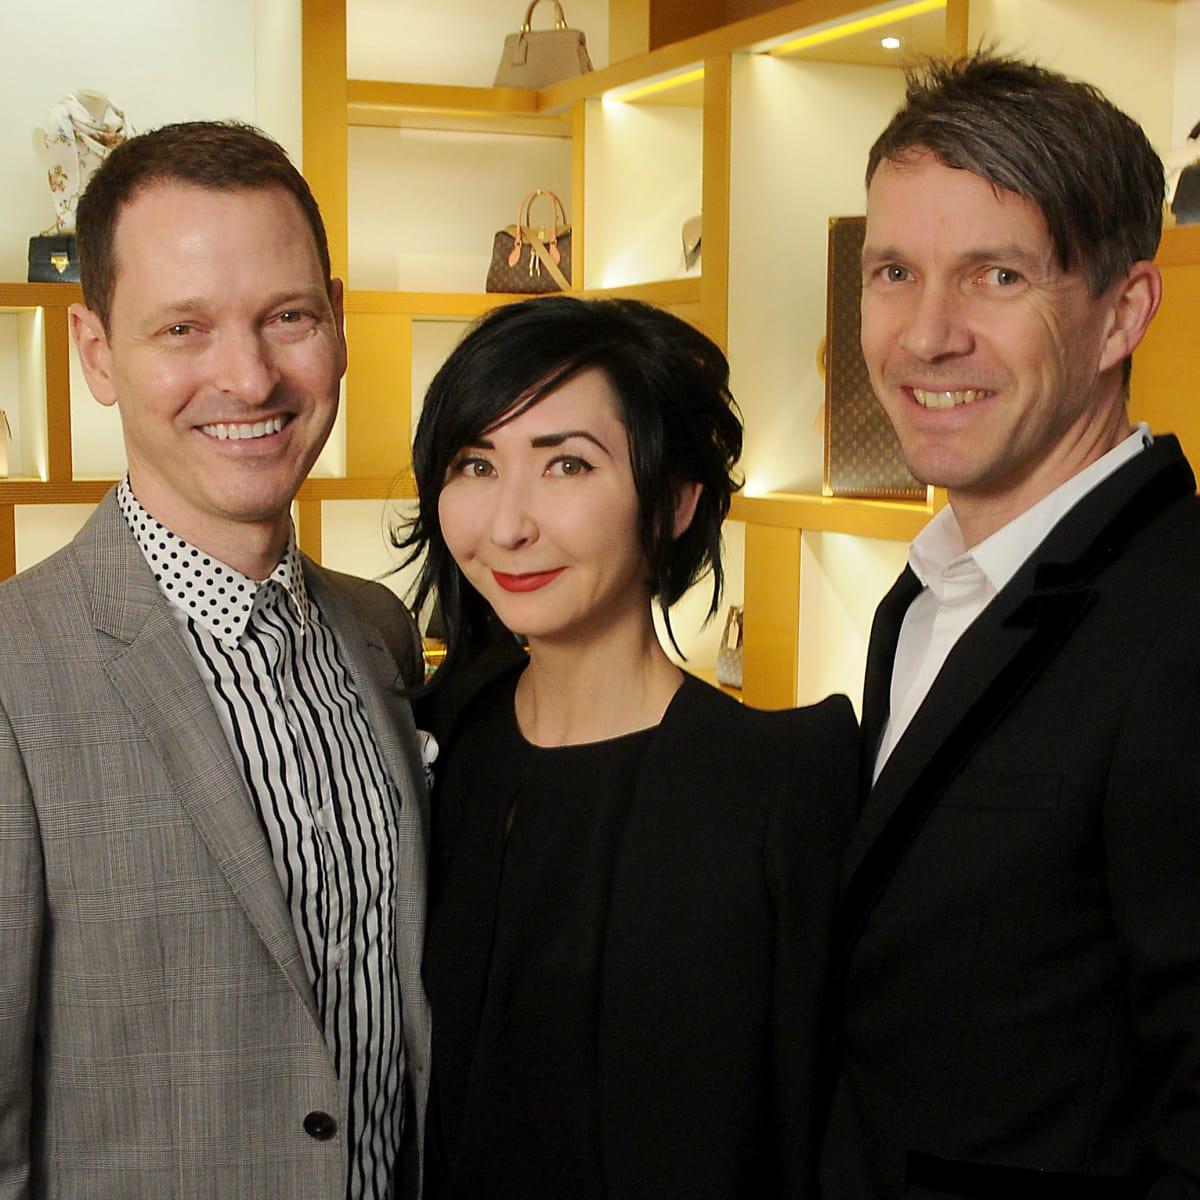 Brian McCulloch, Carrie and Svarre Brandsberg-Dahl